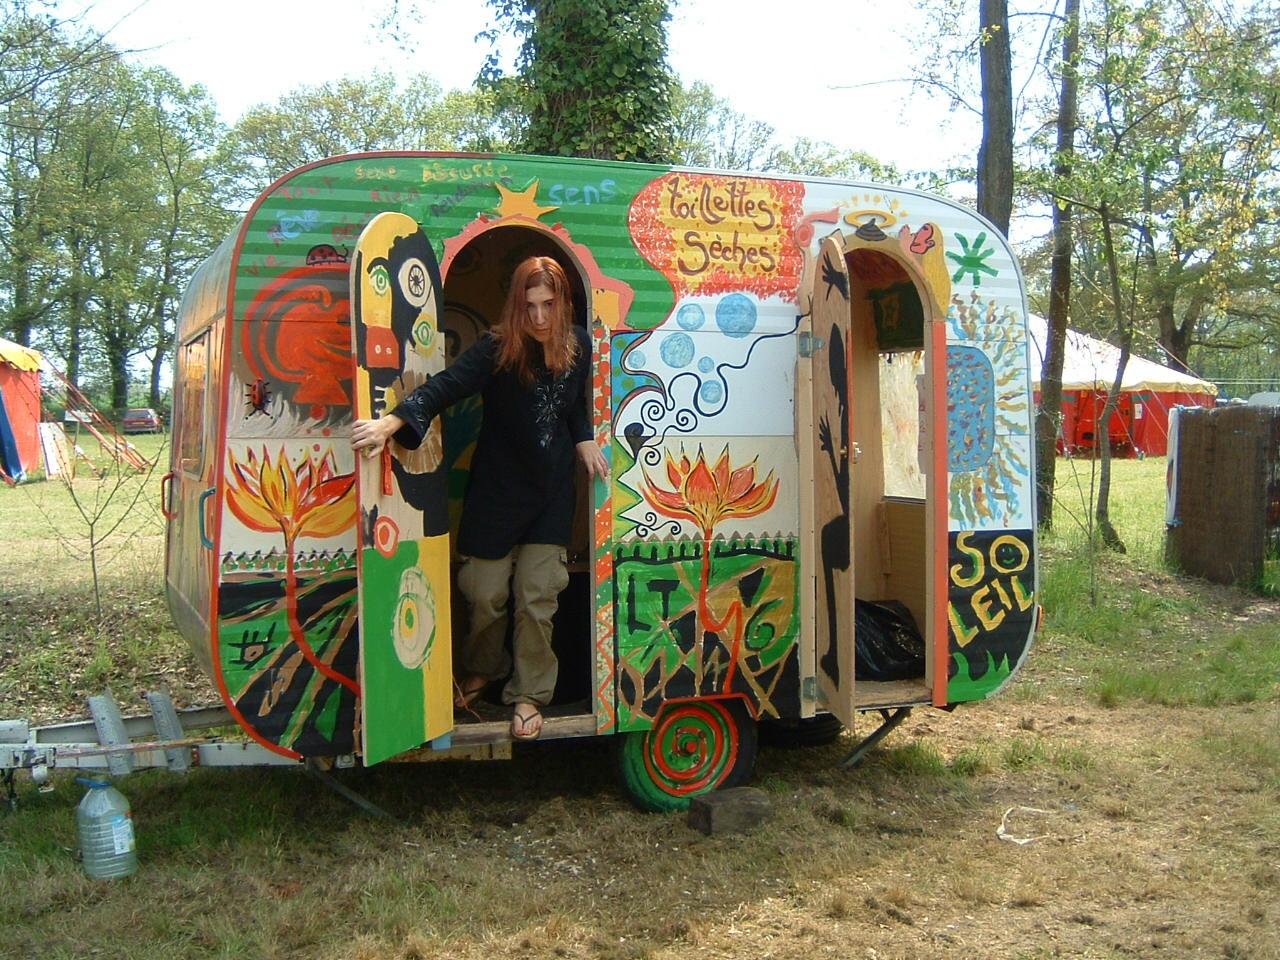 toilette-seche-caravane.jpg